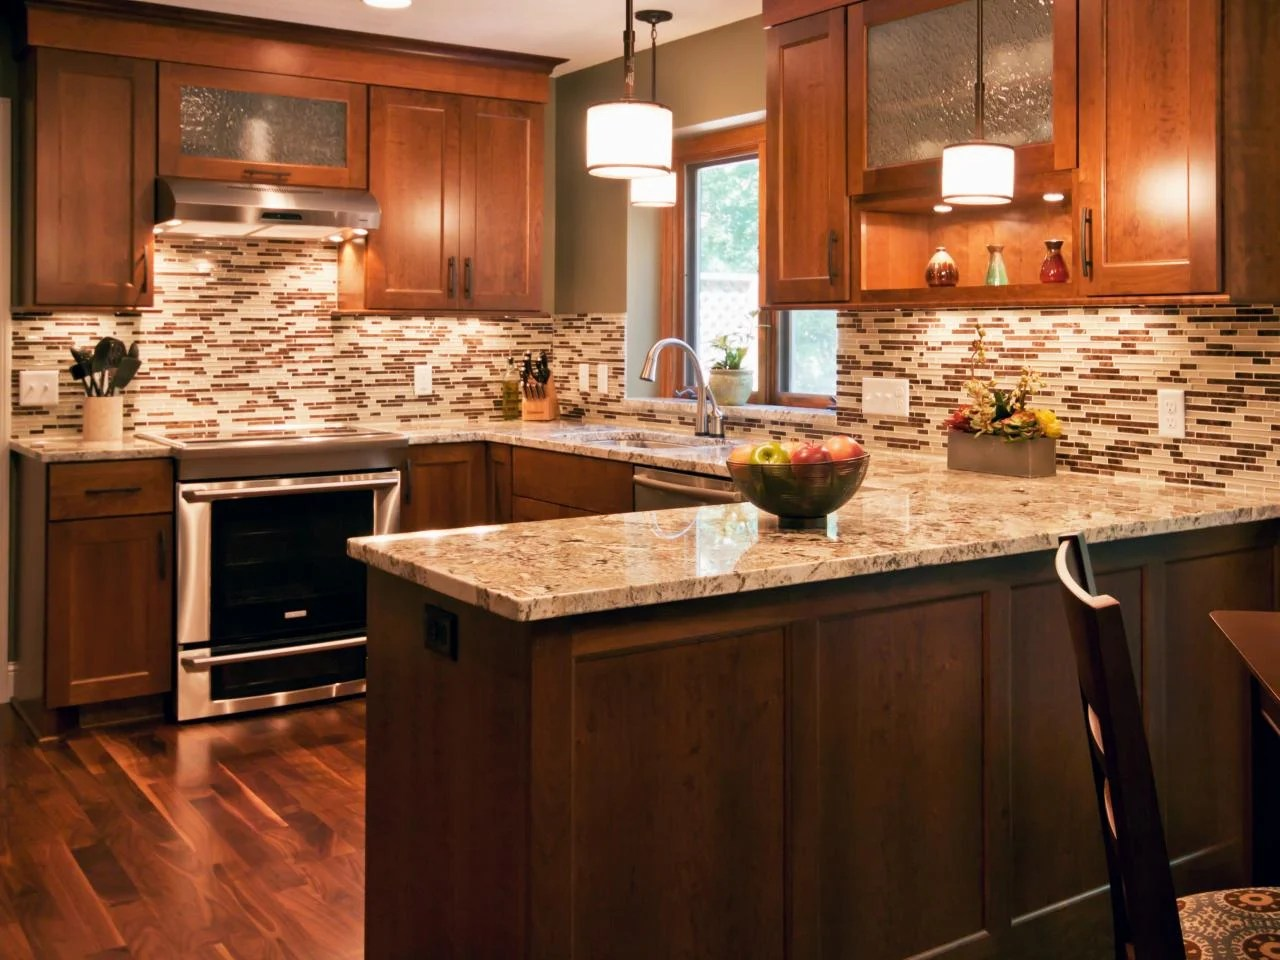 kitchen back splash custom made cabinets 75 backsplash ideas for 2019 tile glass metal etc mosaic